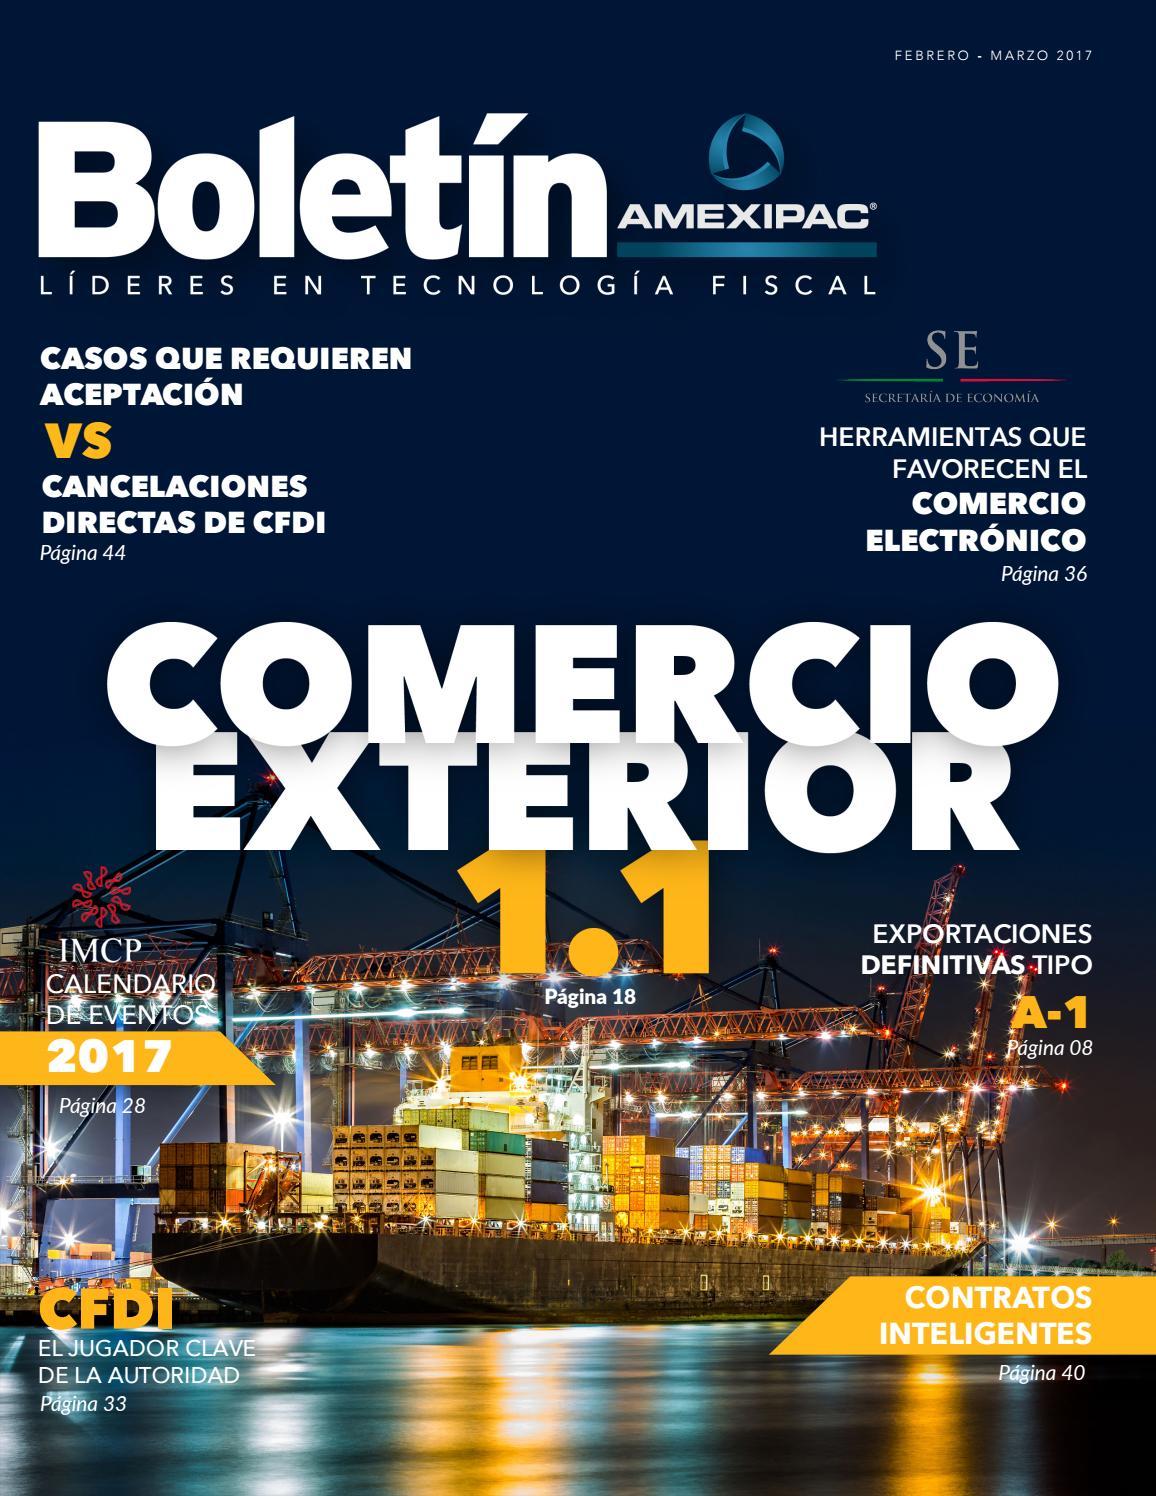 Boletín AMEXIPAC - Febrero-Marzo 2017 by AMEXIPAC - issuu